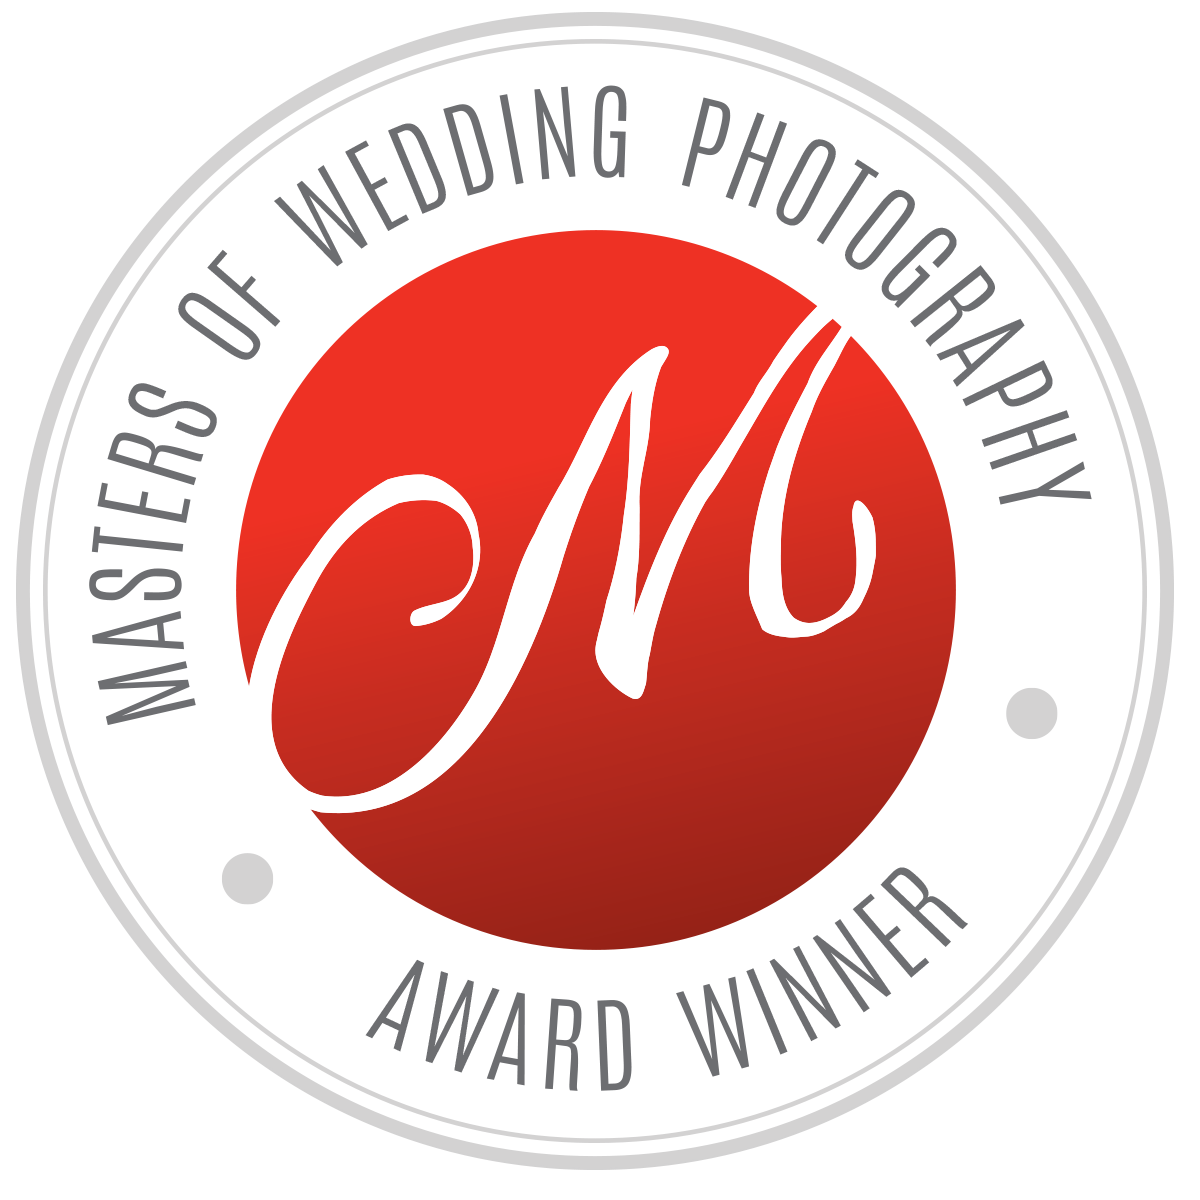 Masters-Award-Winner-600-red-retina-@2x